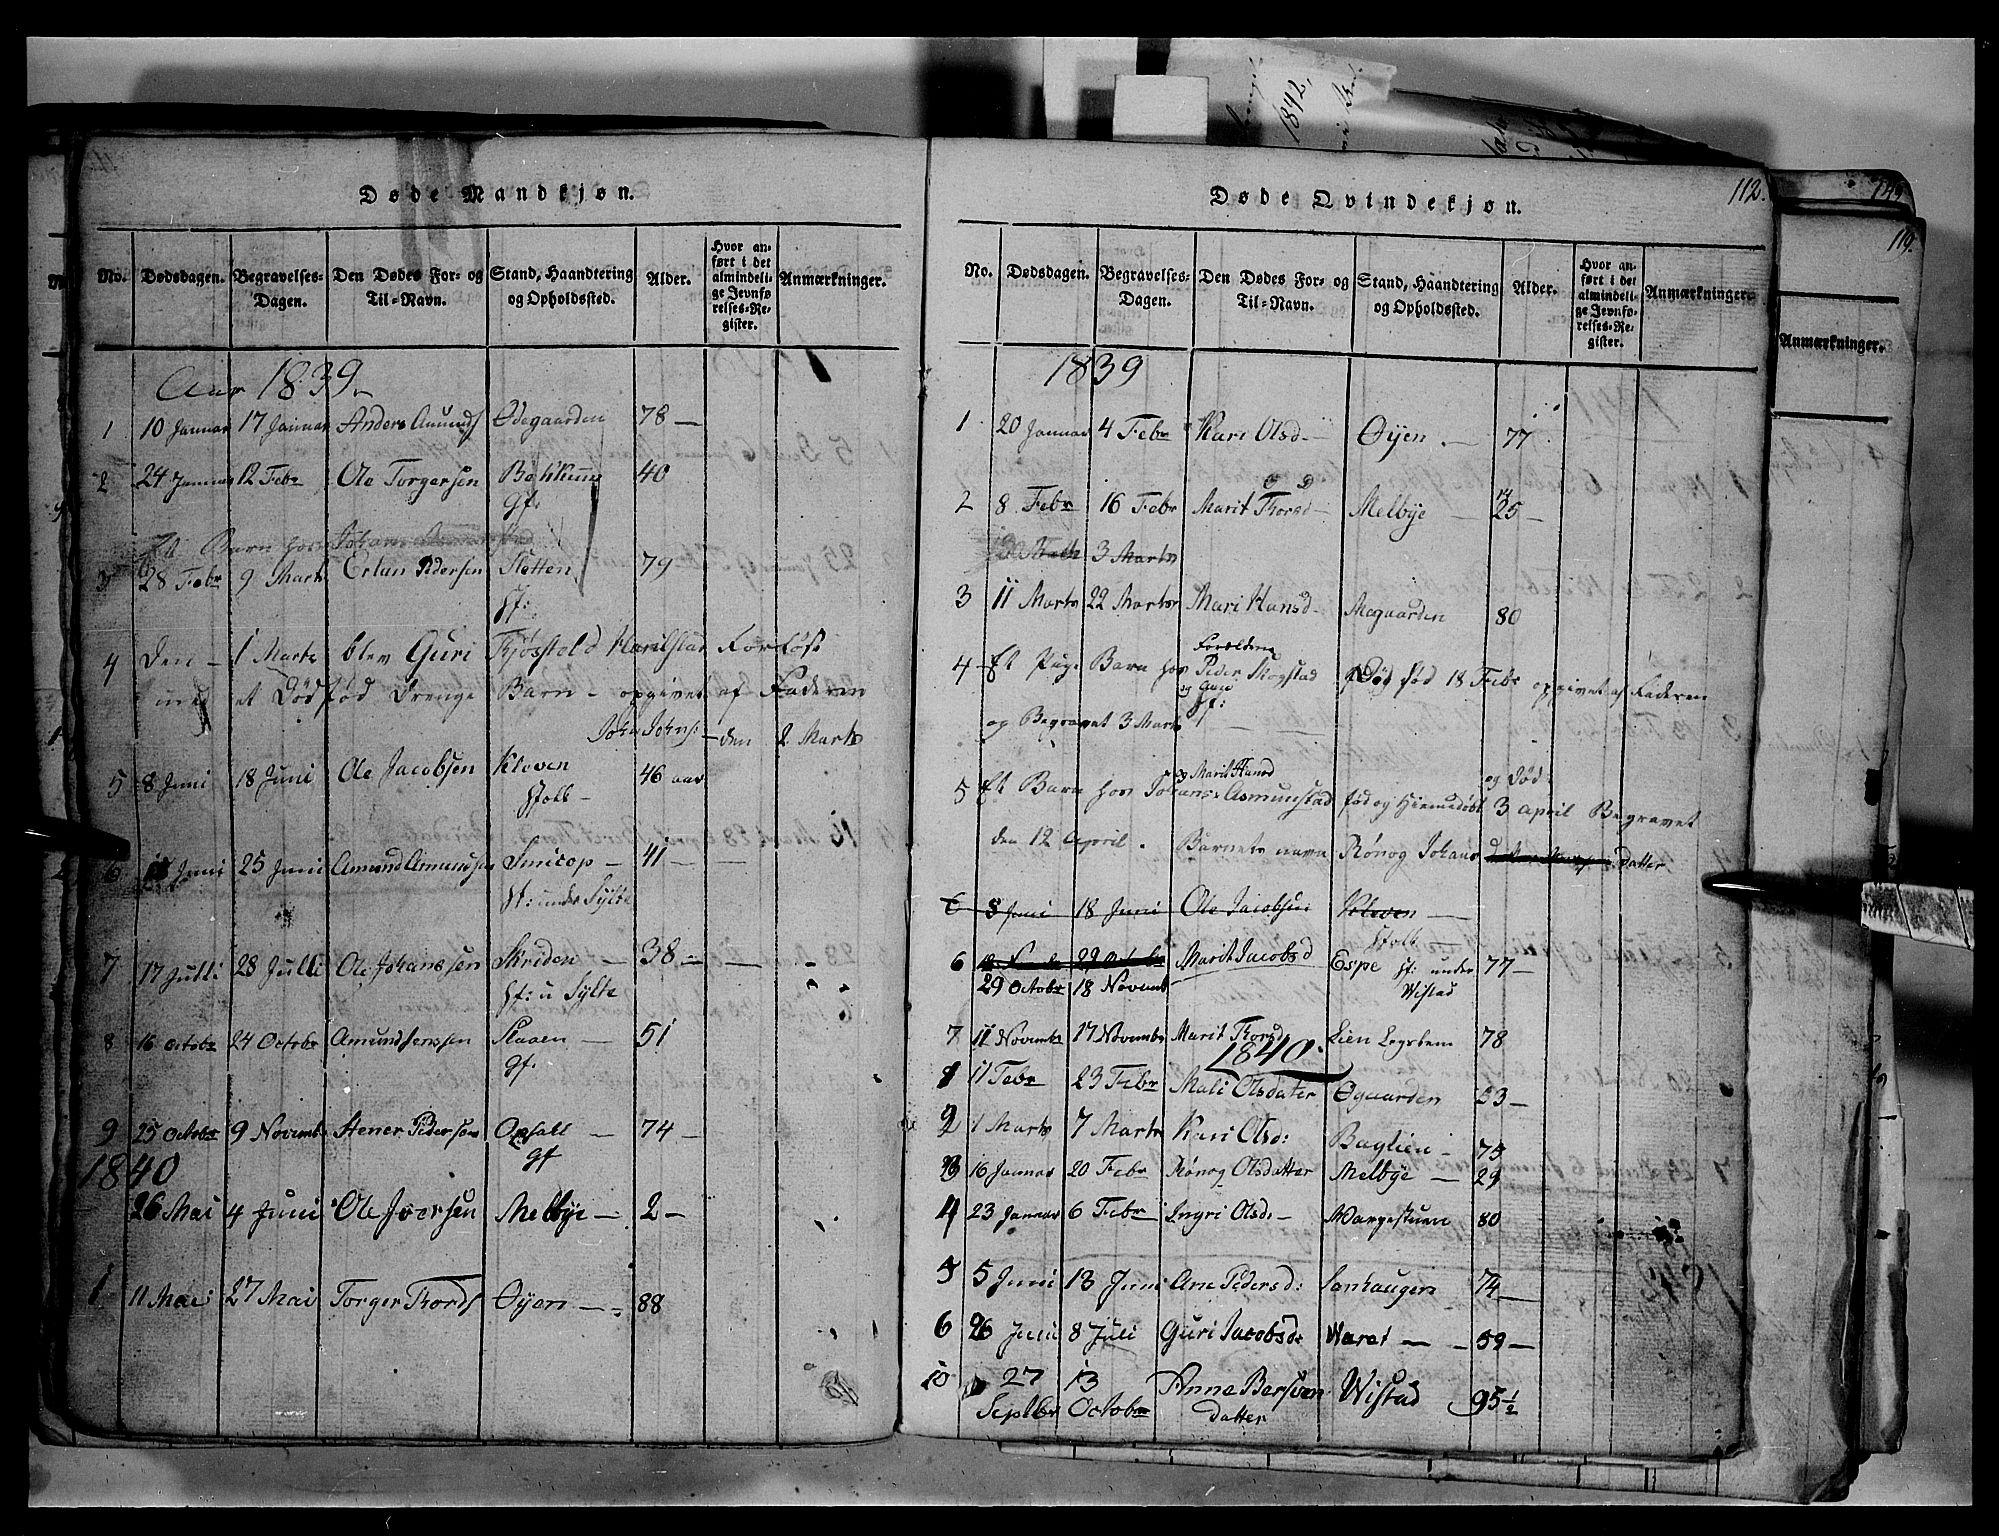 SAH, Fron prestekontor, H/Ha/Hab/L0003: Klokkerbok nr. 3, 1816-1850, s. 112